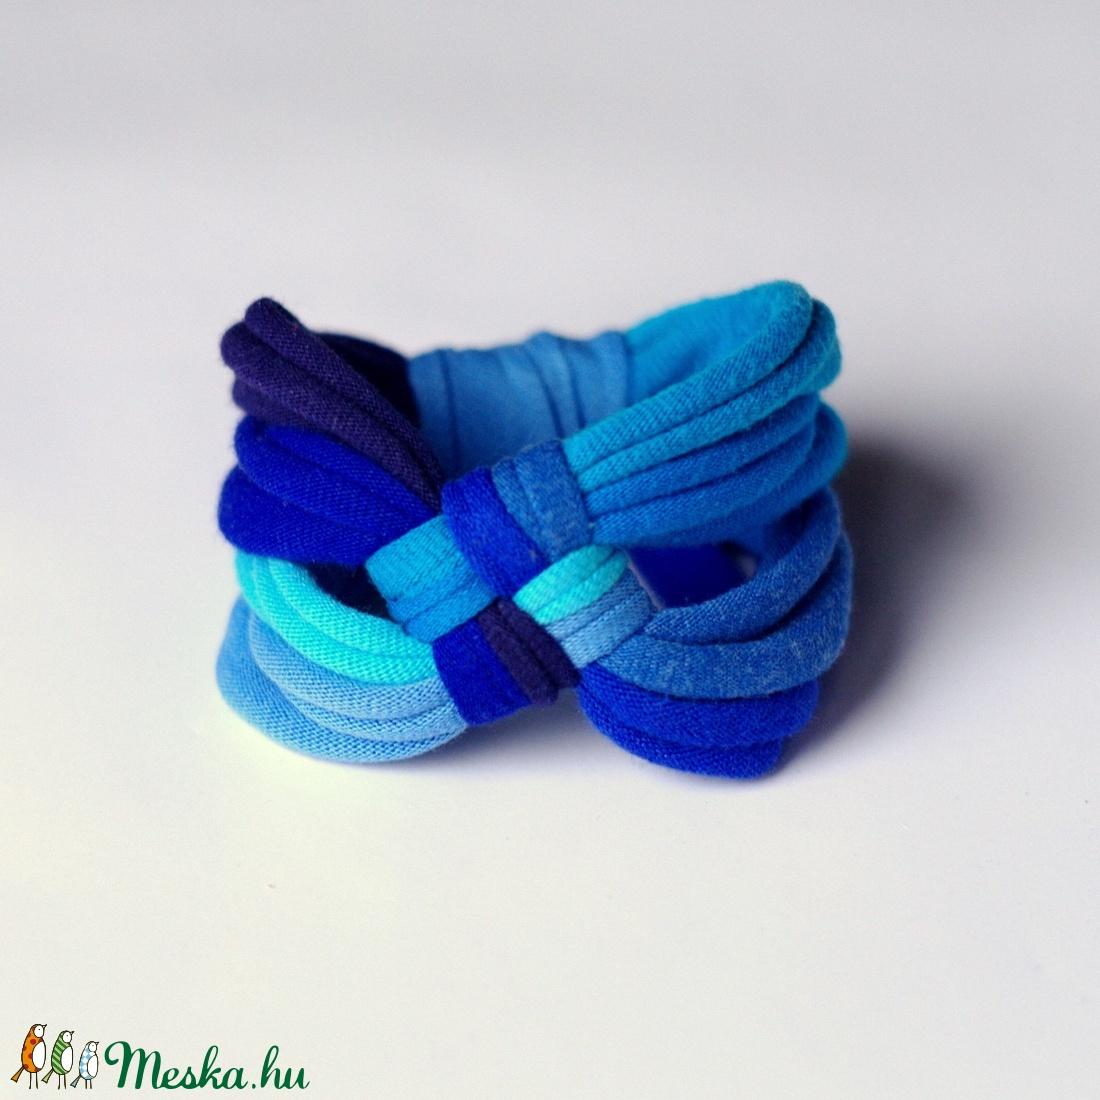 DIAGONAL - textil karkötő, kék (cirrhopp) - Meska.hu